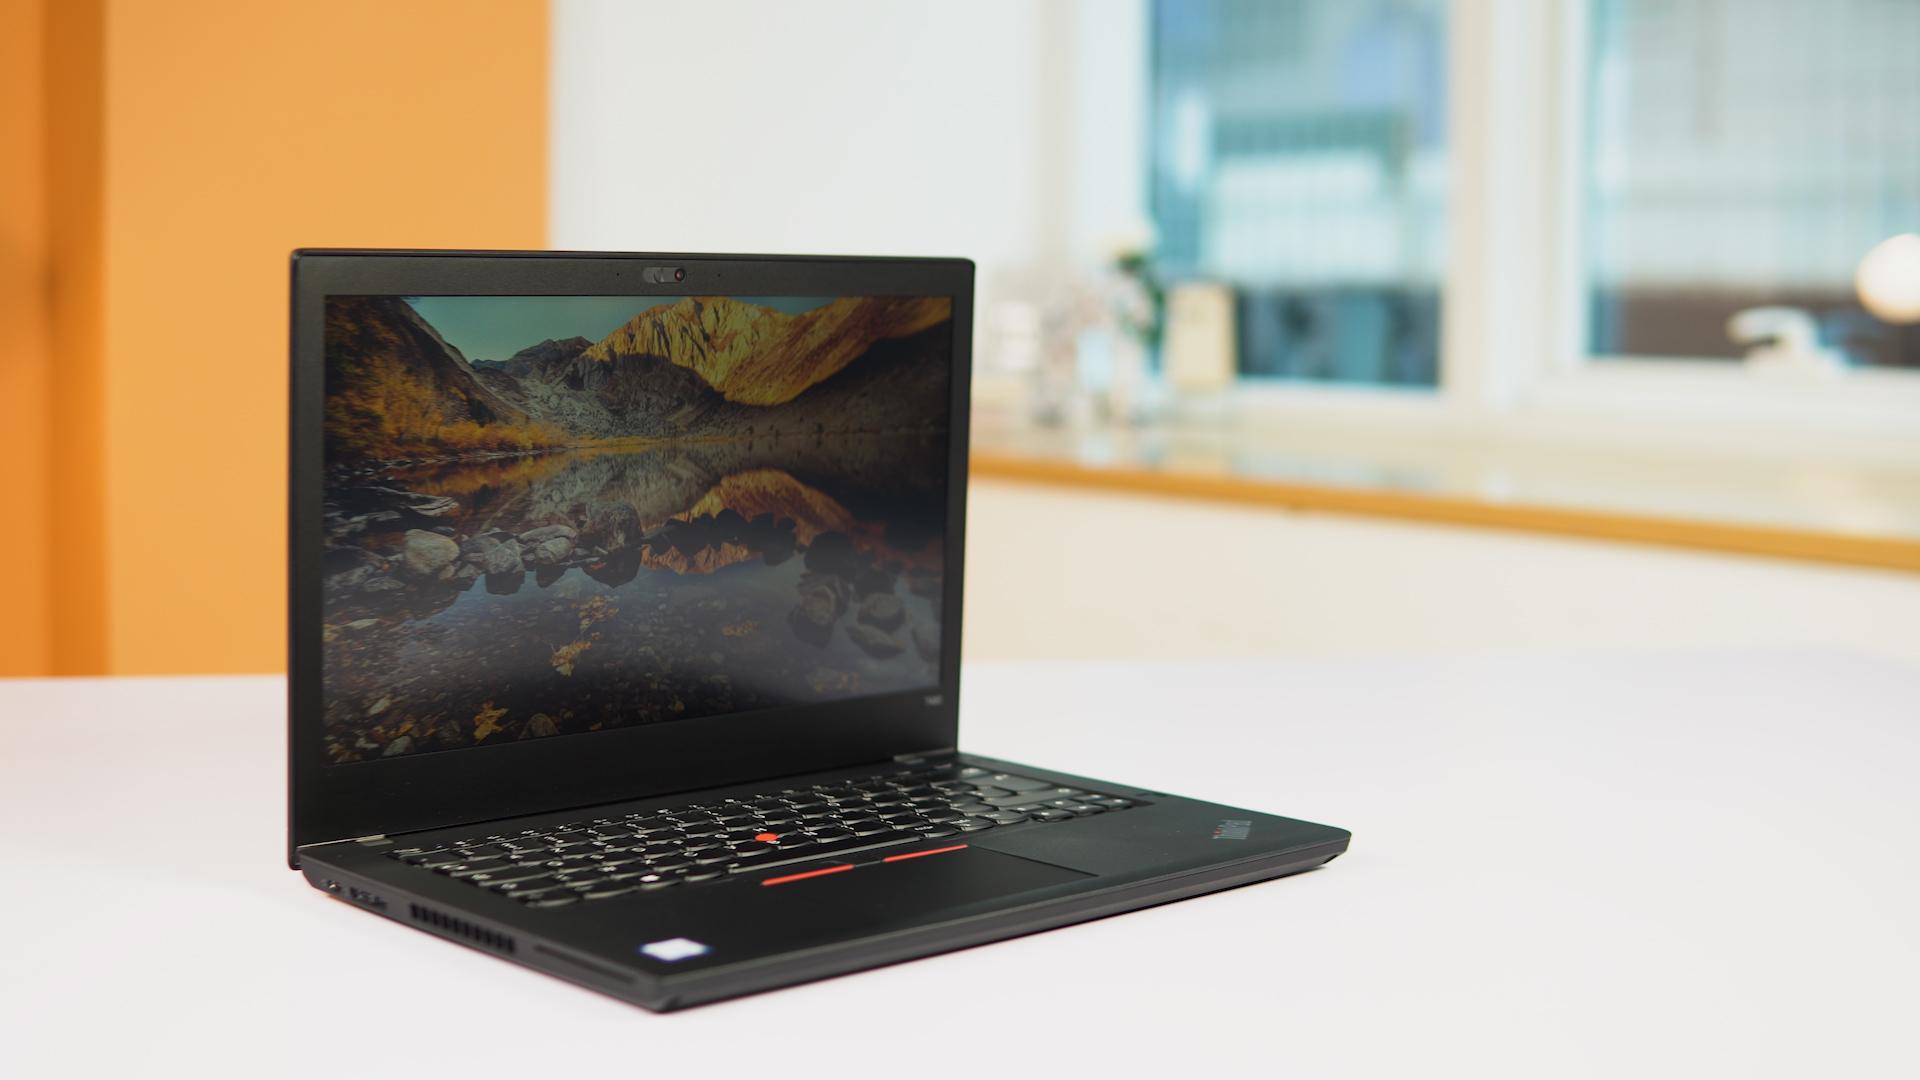 100% Full Box] Laptop Lenovo Thinkpad T480 - Intel Core i5